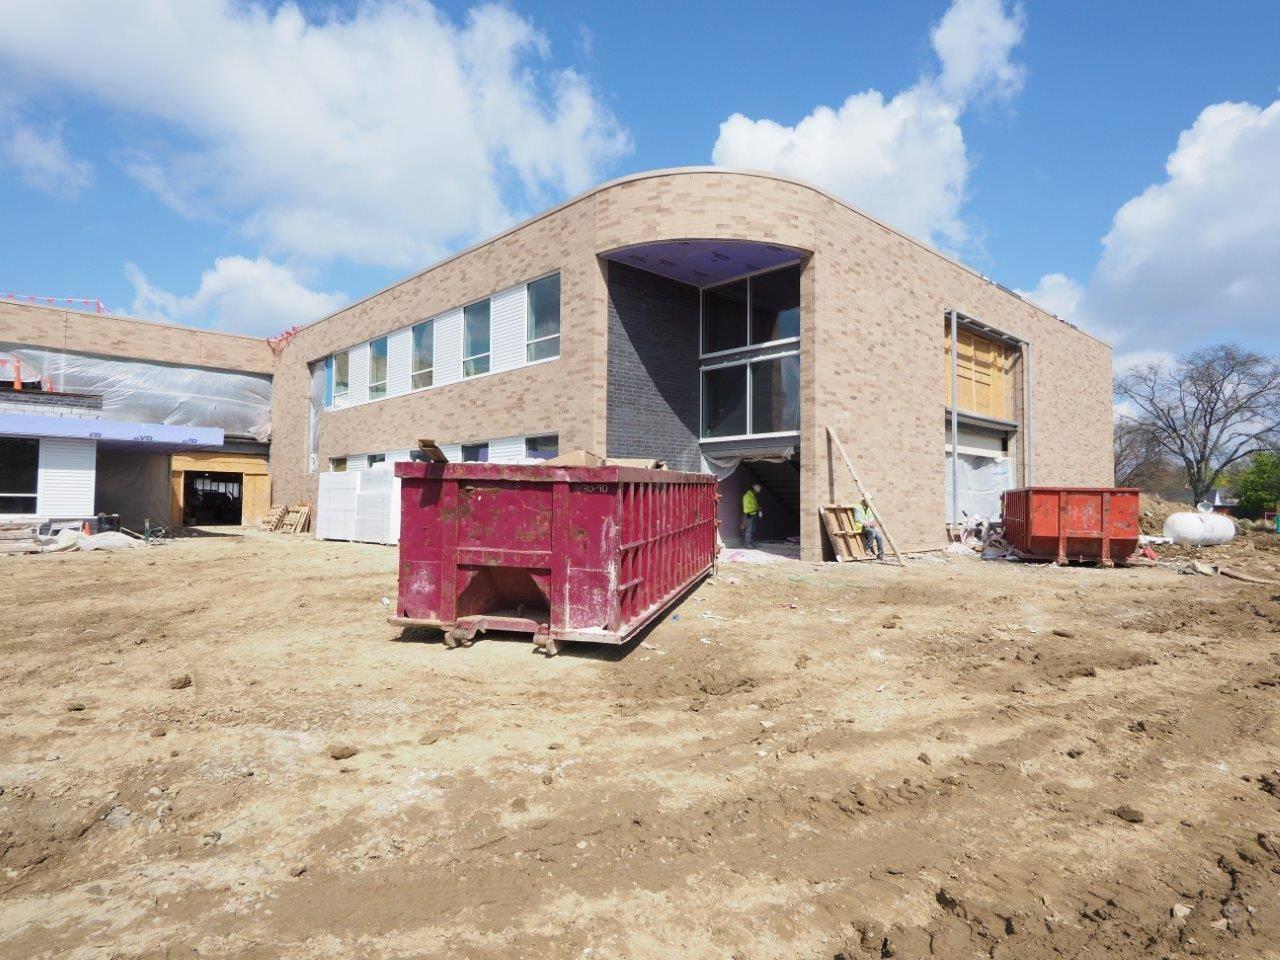 The new Windermere Elementary School